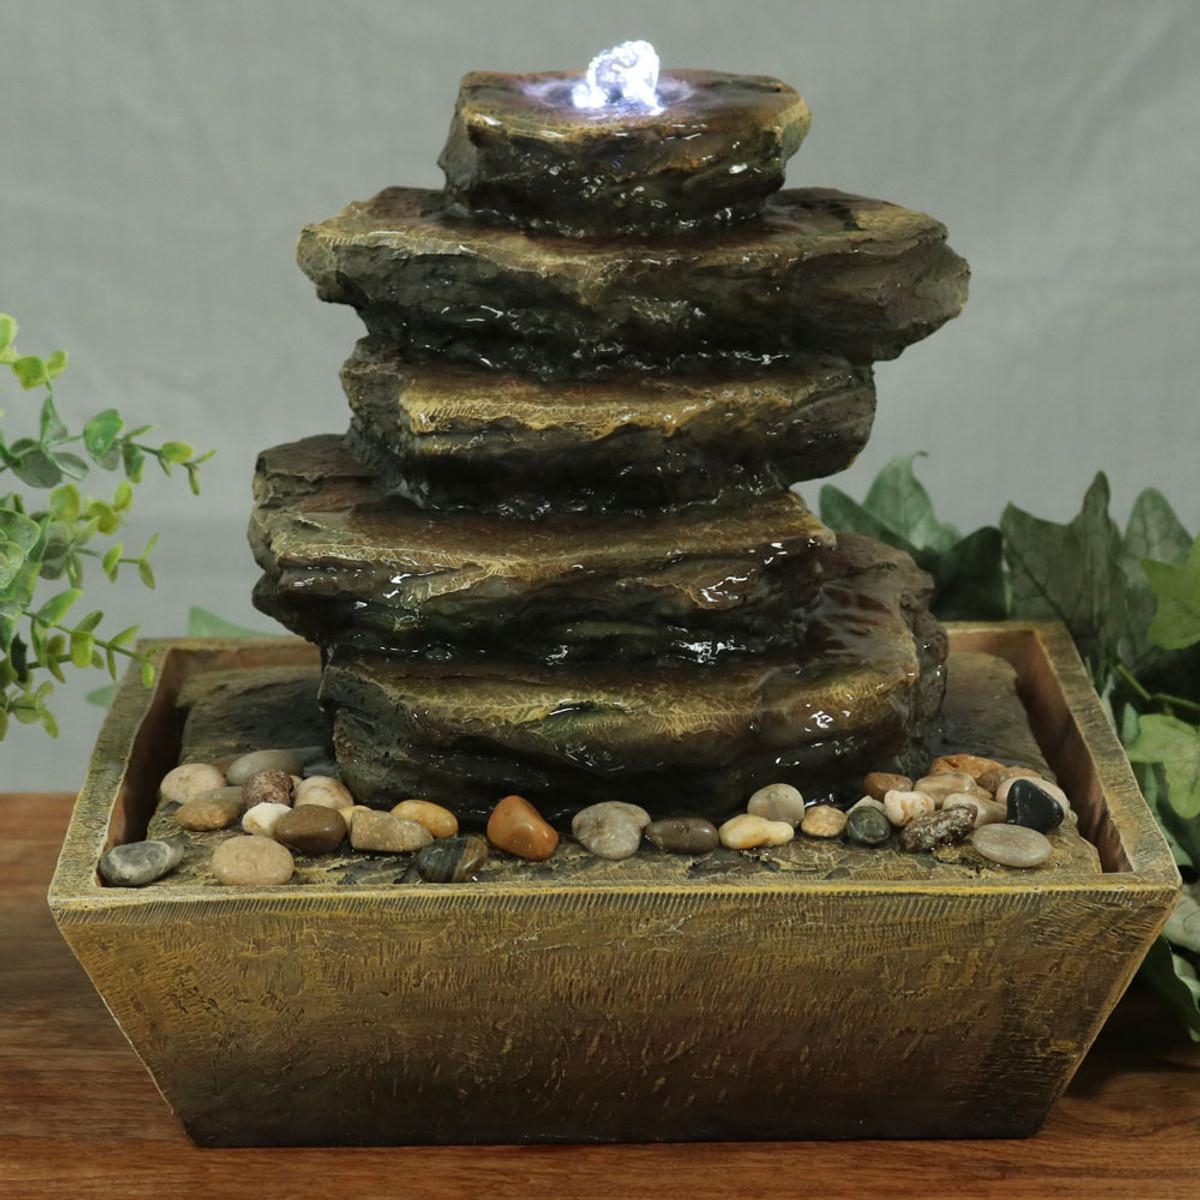 Sunnydaze Cascading Rocks Tabletop Fountain with LED Lights e20ca70ce